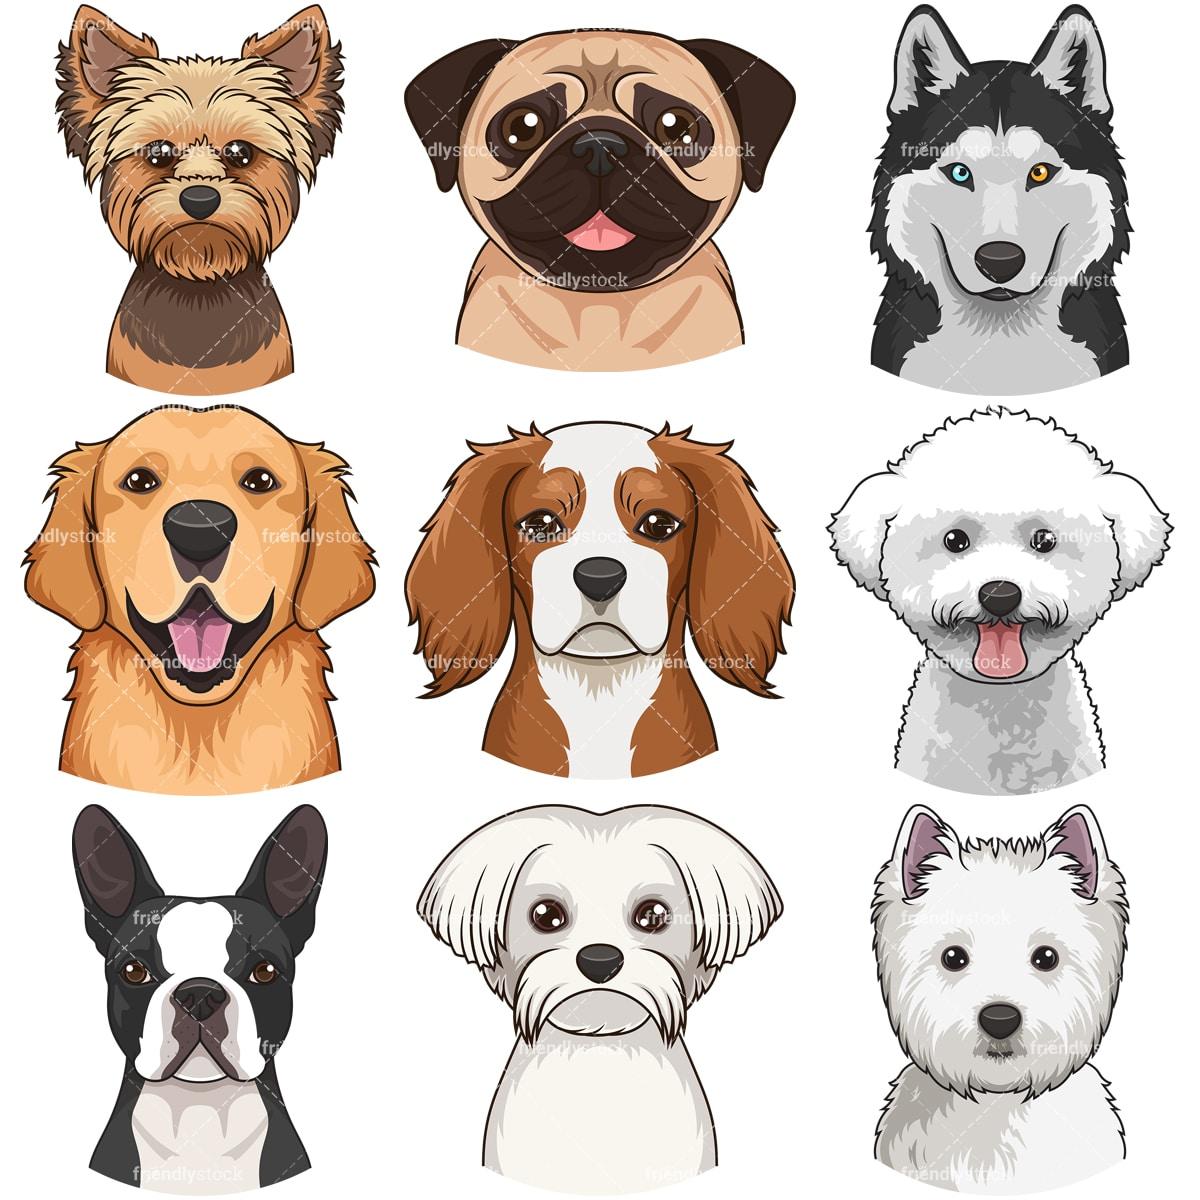 Dog Faces Clipart Bundle 1 Clipart Vector Collection Friendlystock